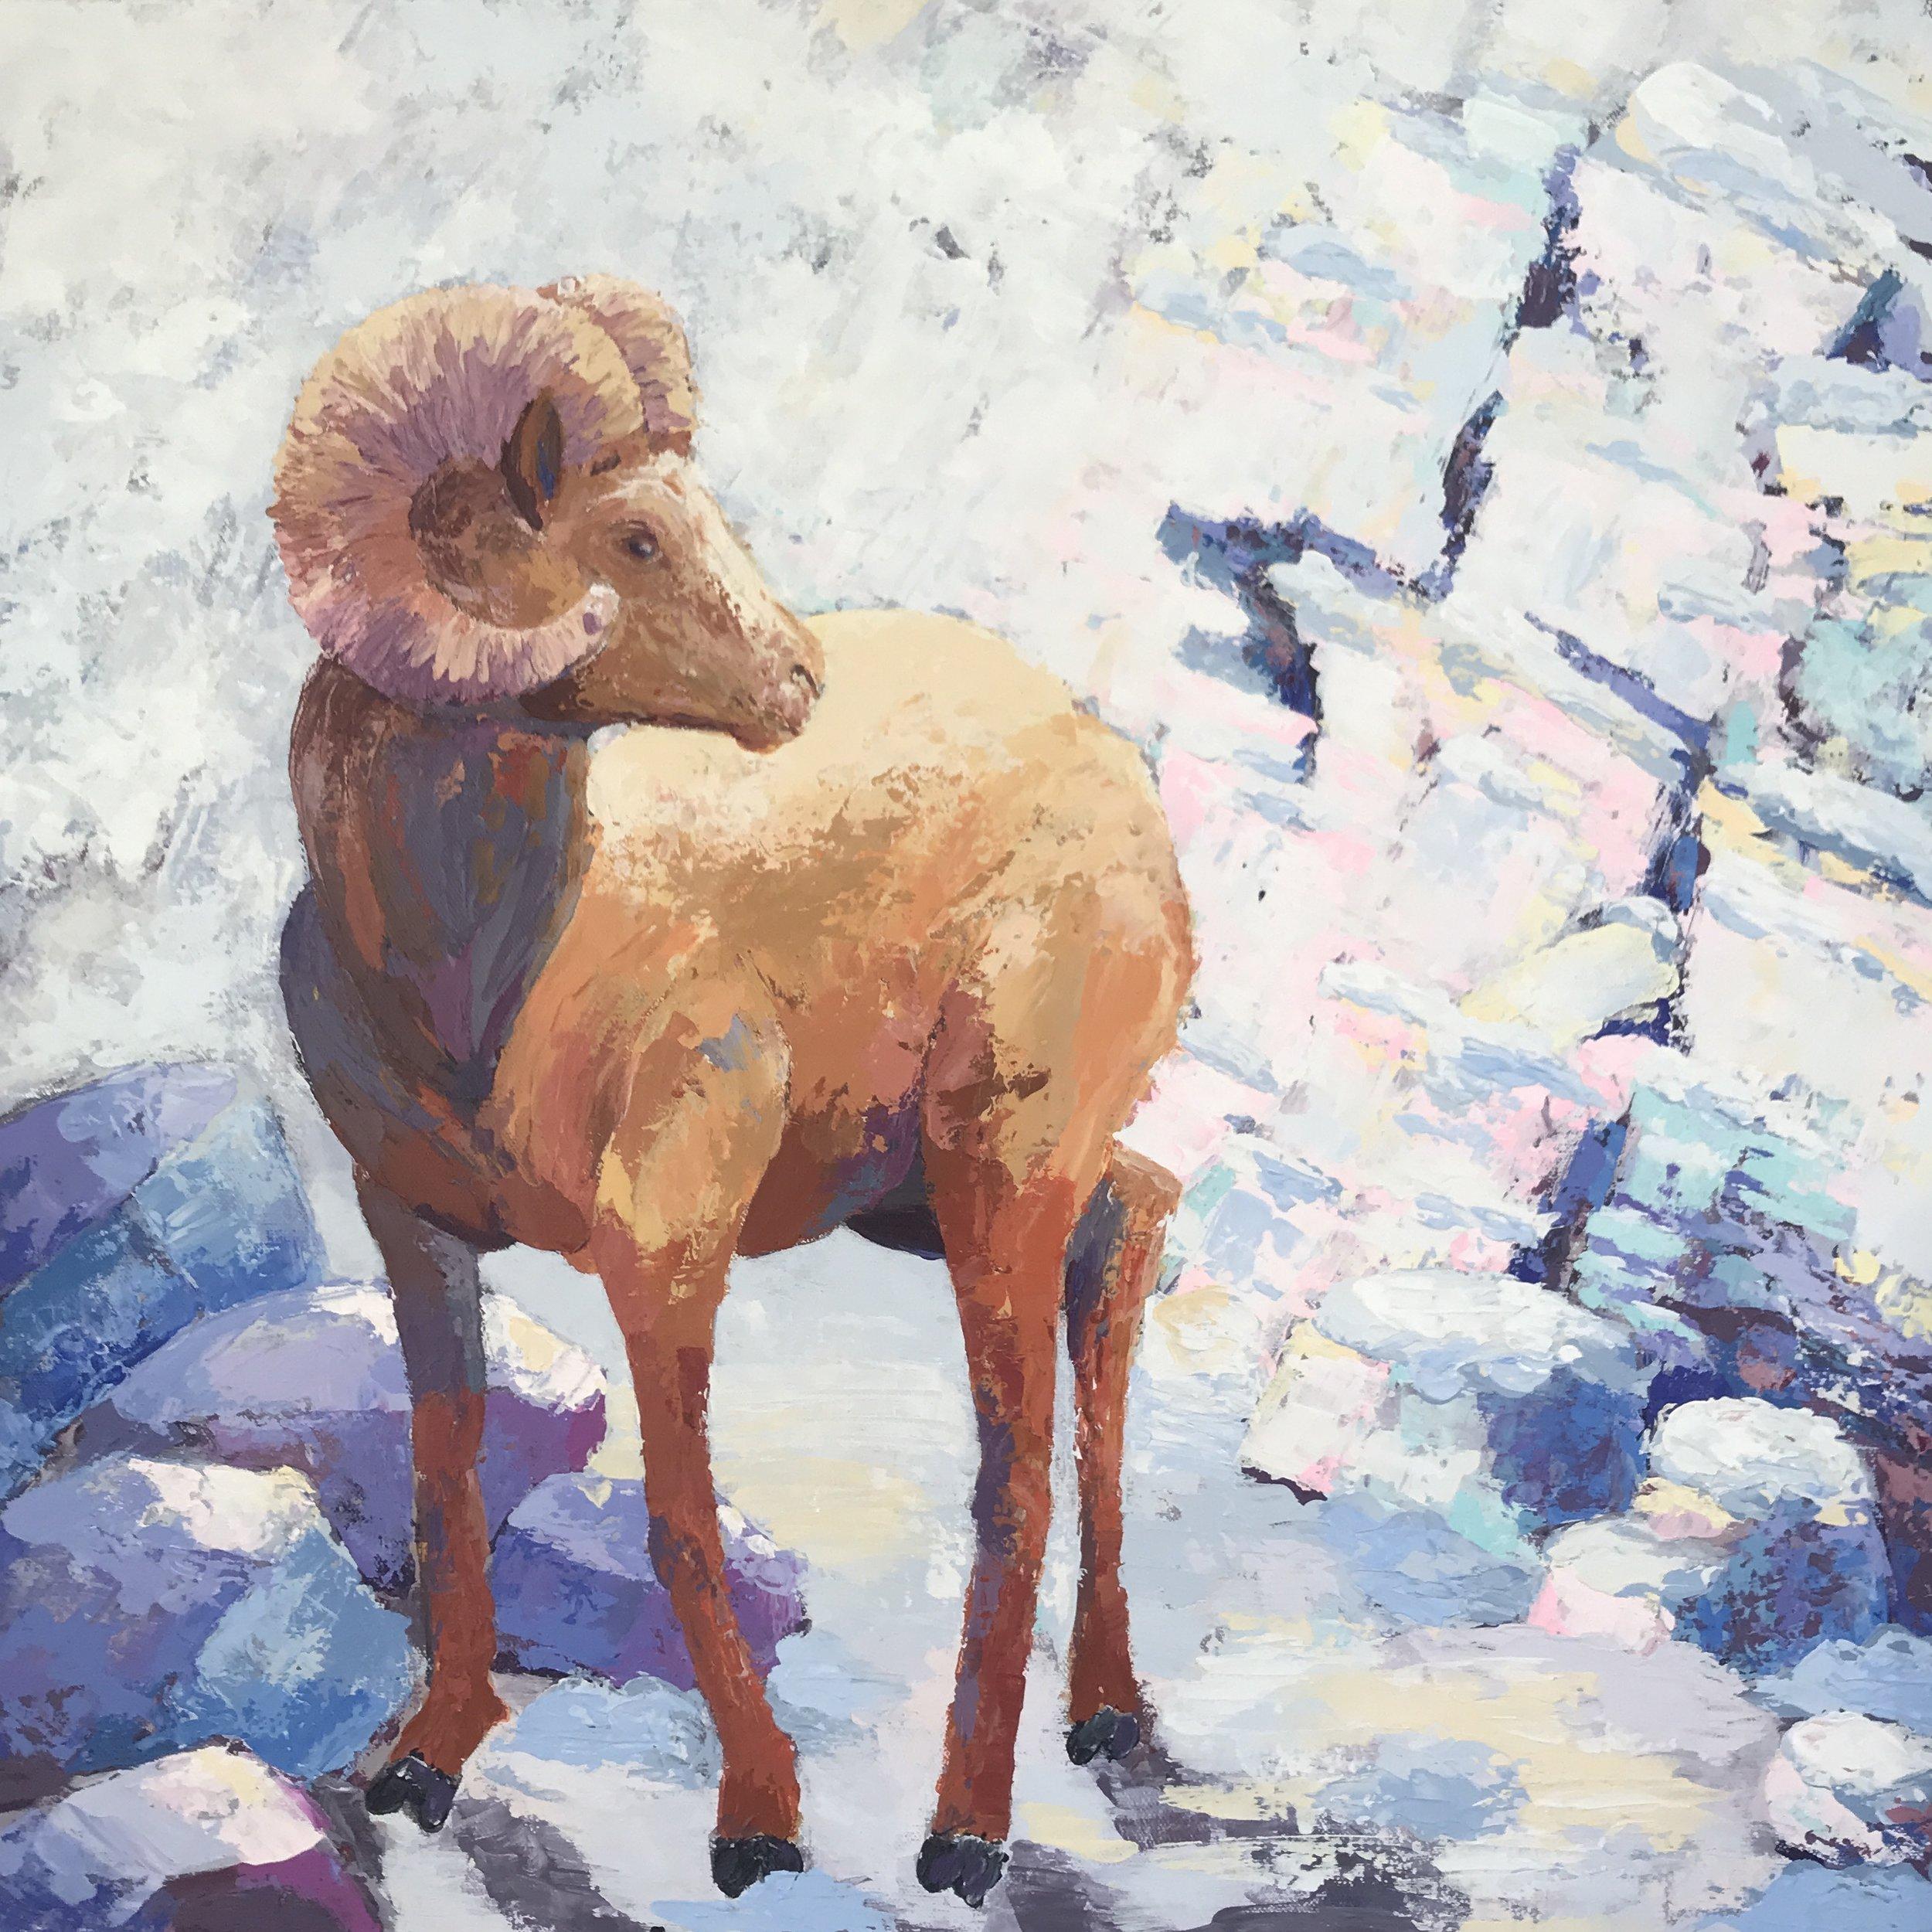 DWenarchuk - Winter Ram 24x24 Acrylic on Canvas.jpeg